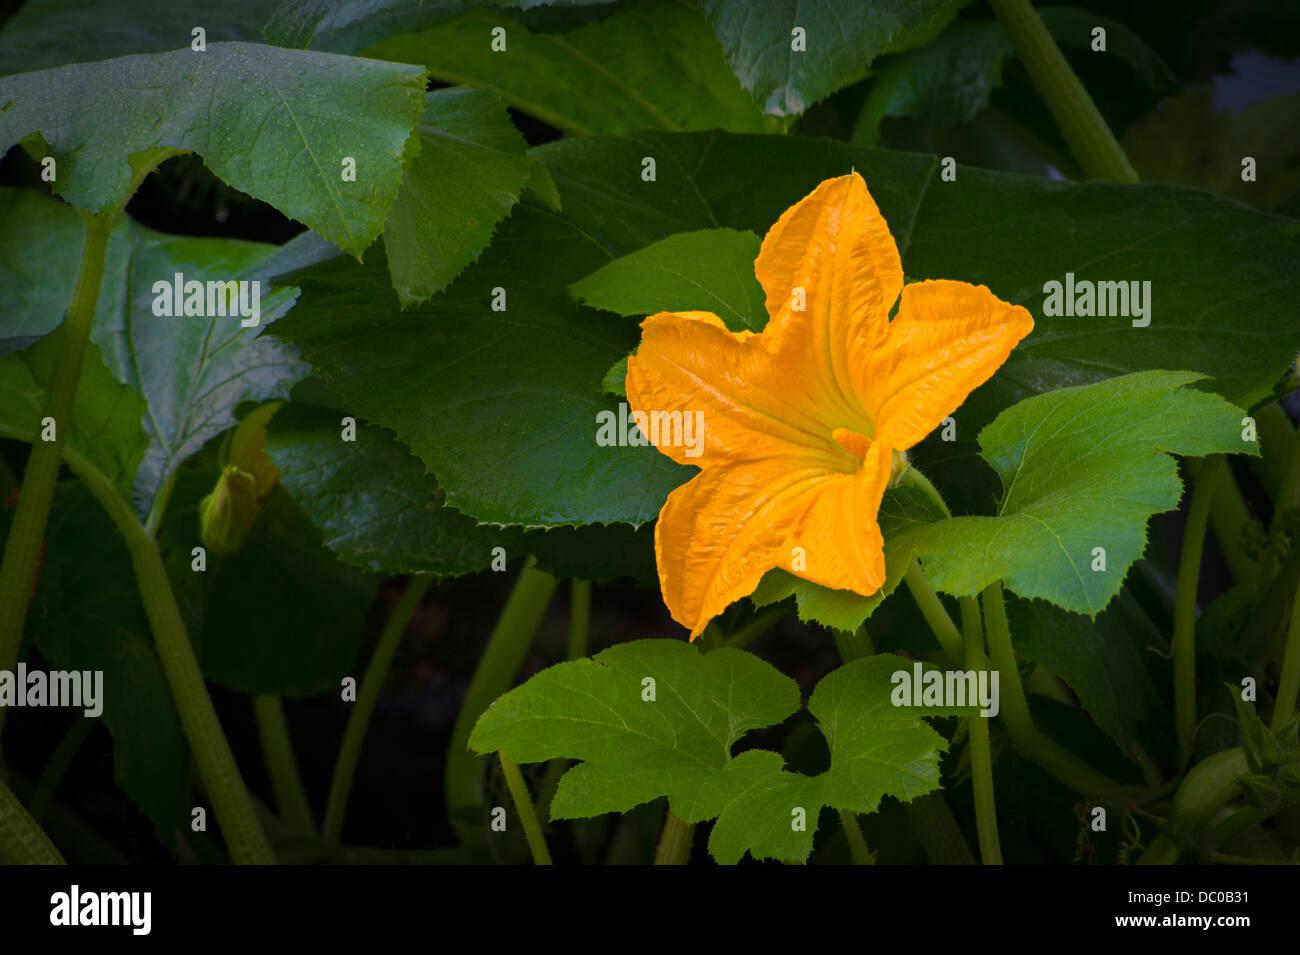 Yellow Flower On Gourd Vine Stock Photo 59015685 Alamy